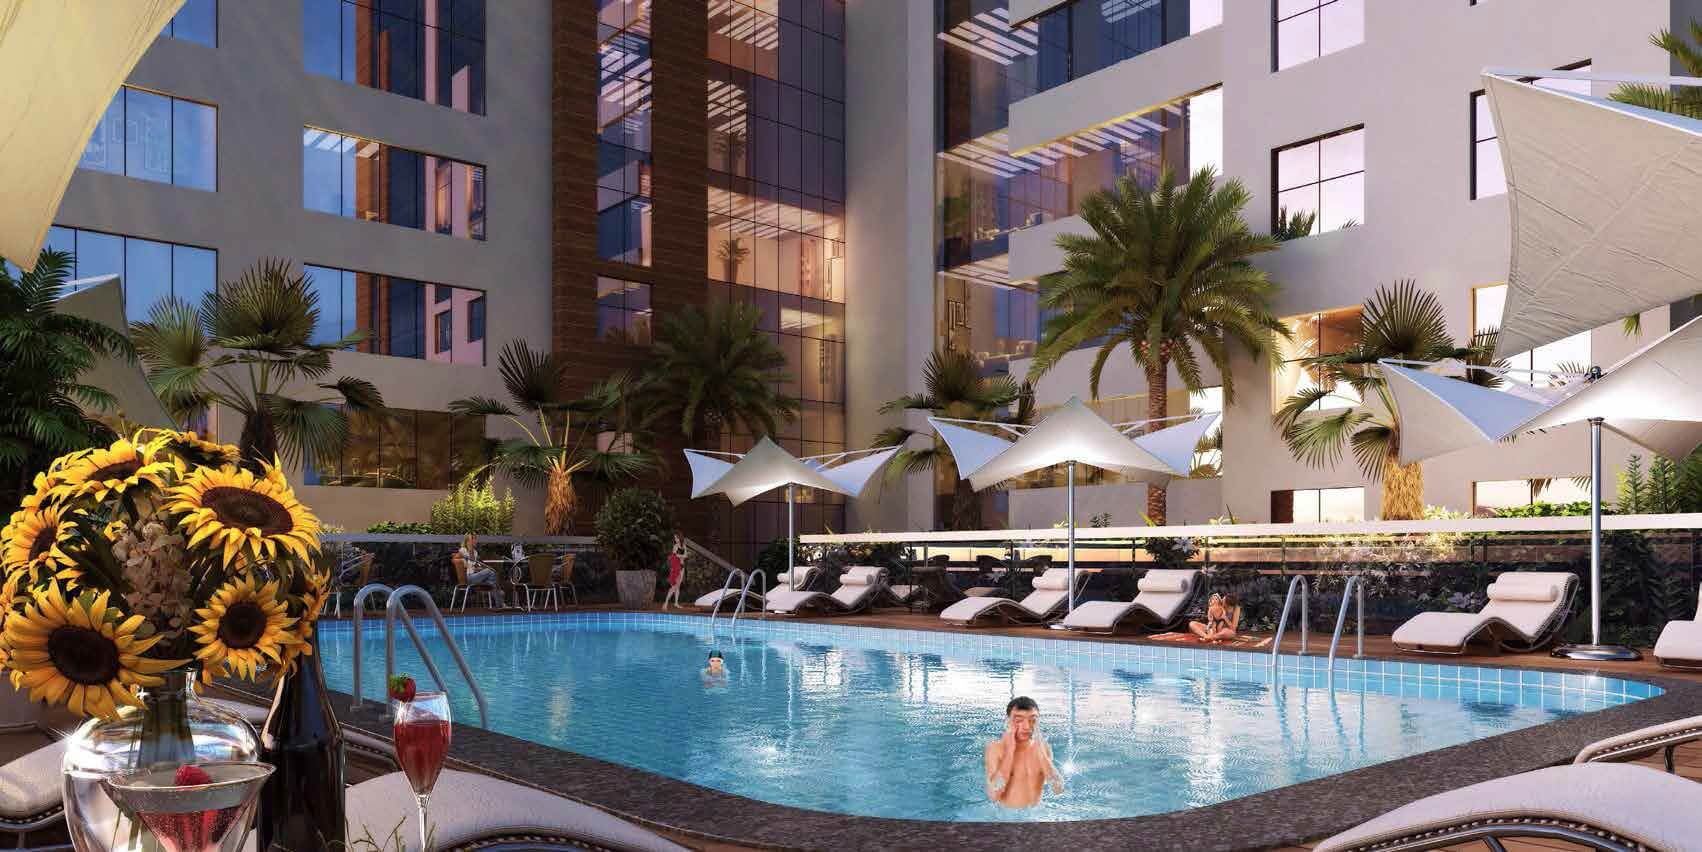 farishta serviced apartments amenities features9